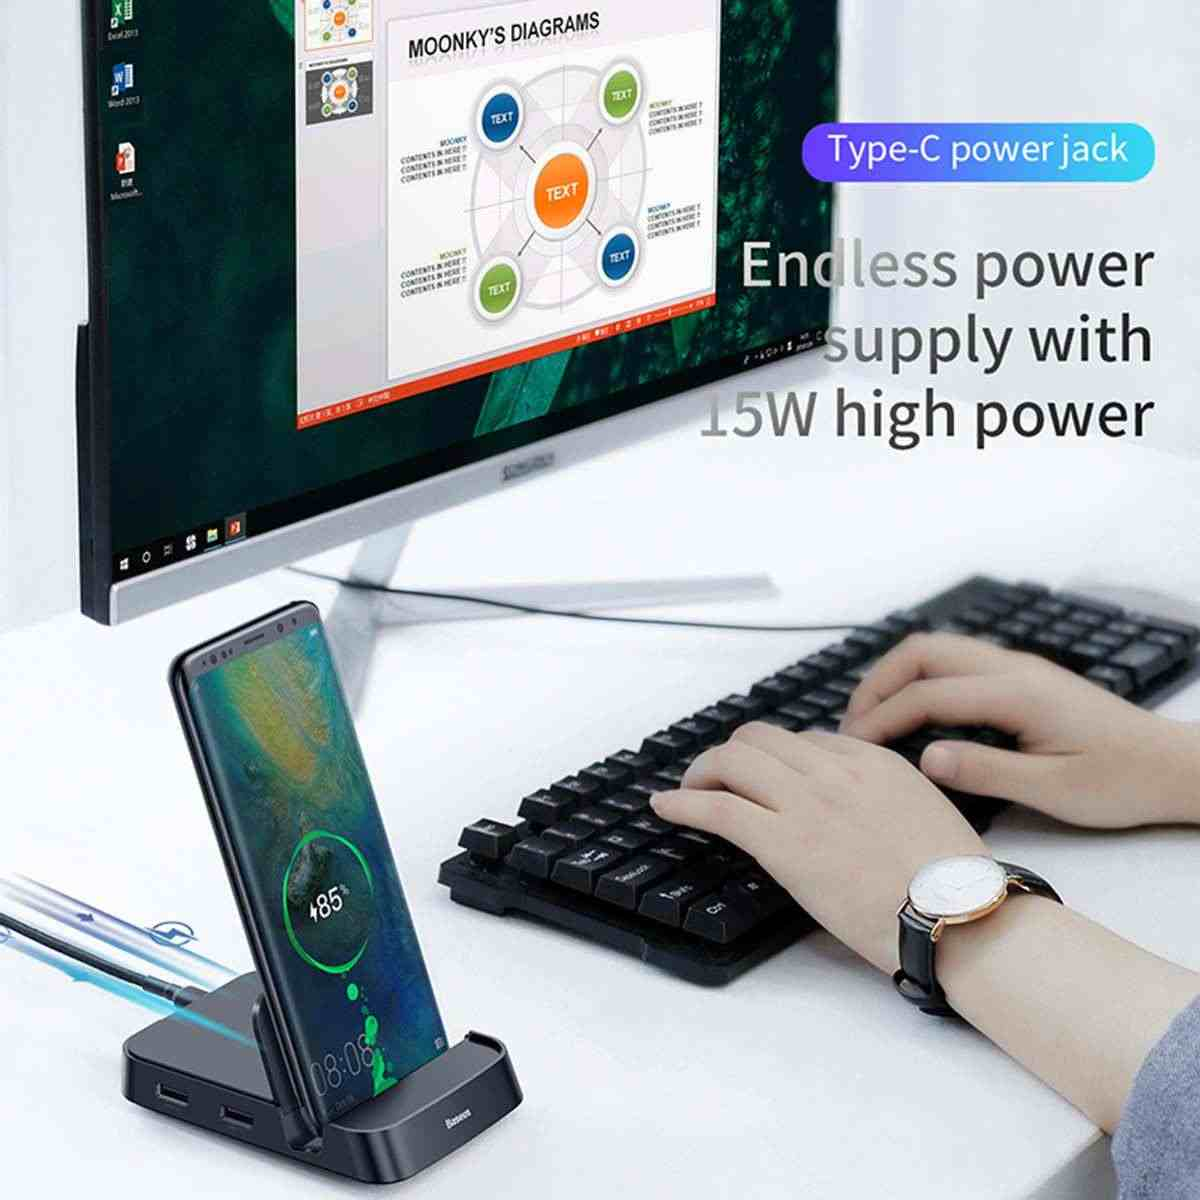 Baseus 15W USB نوع C محور قاعدة لتثبيت الكمبيوتر المحمول لسامسونج S10 ل Dex سادة محطة USB إلى HDMI حوض الطاقة محول لهواوي P30 P20 برو